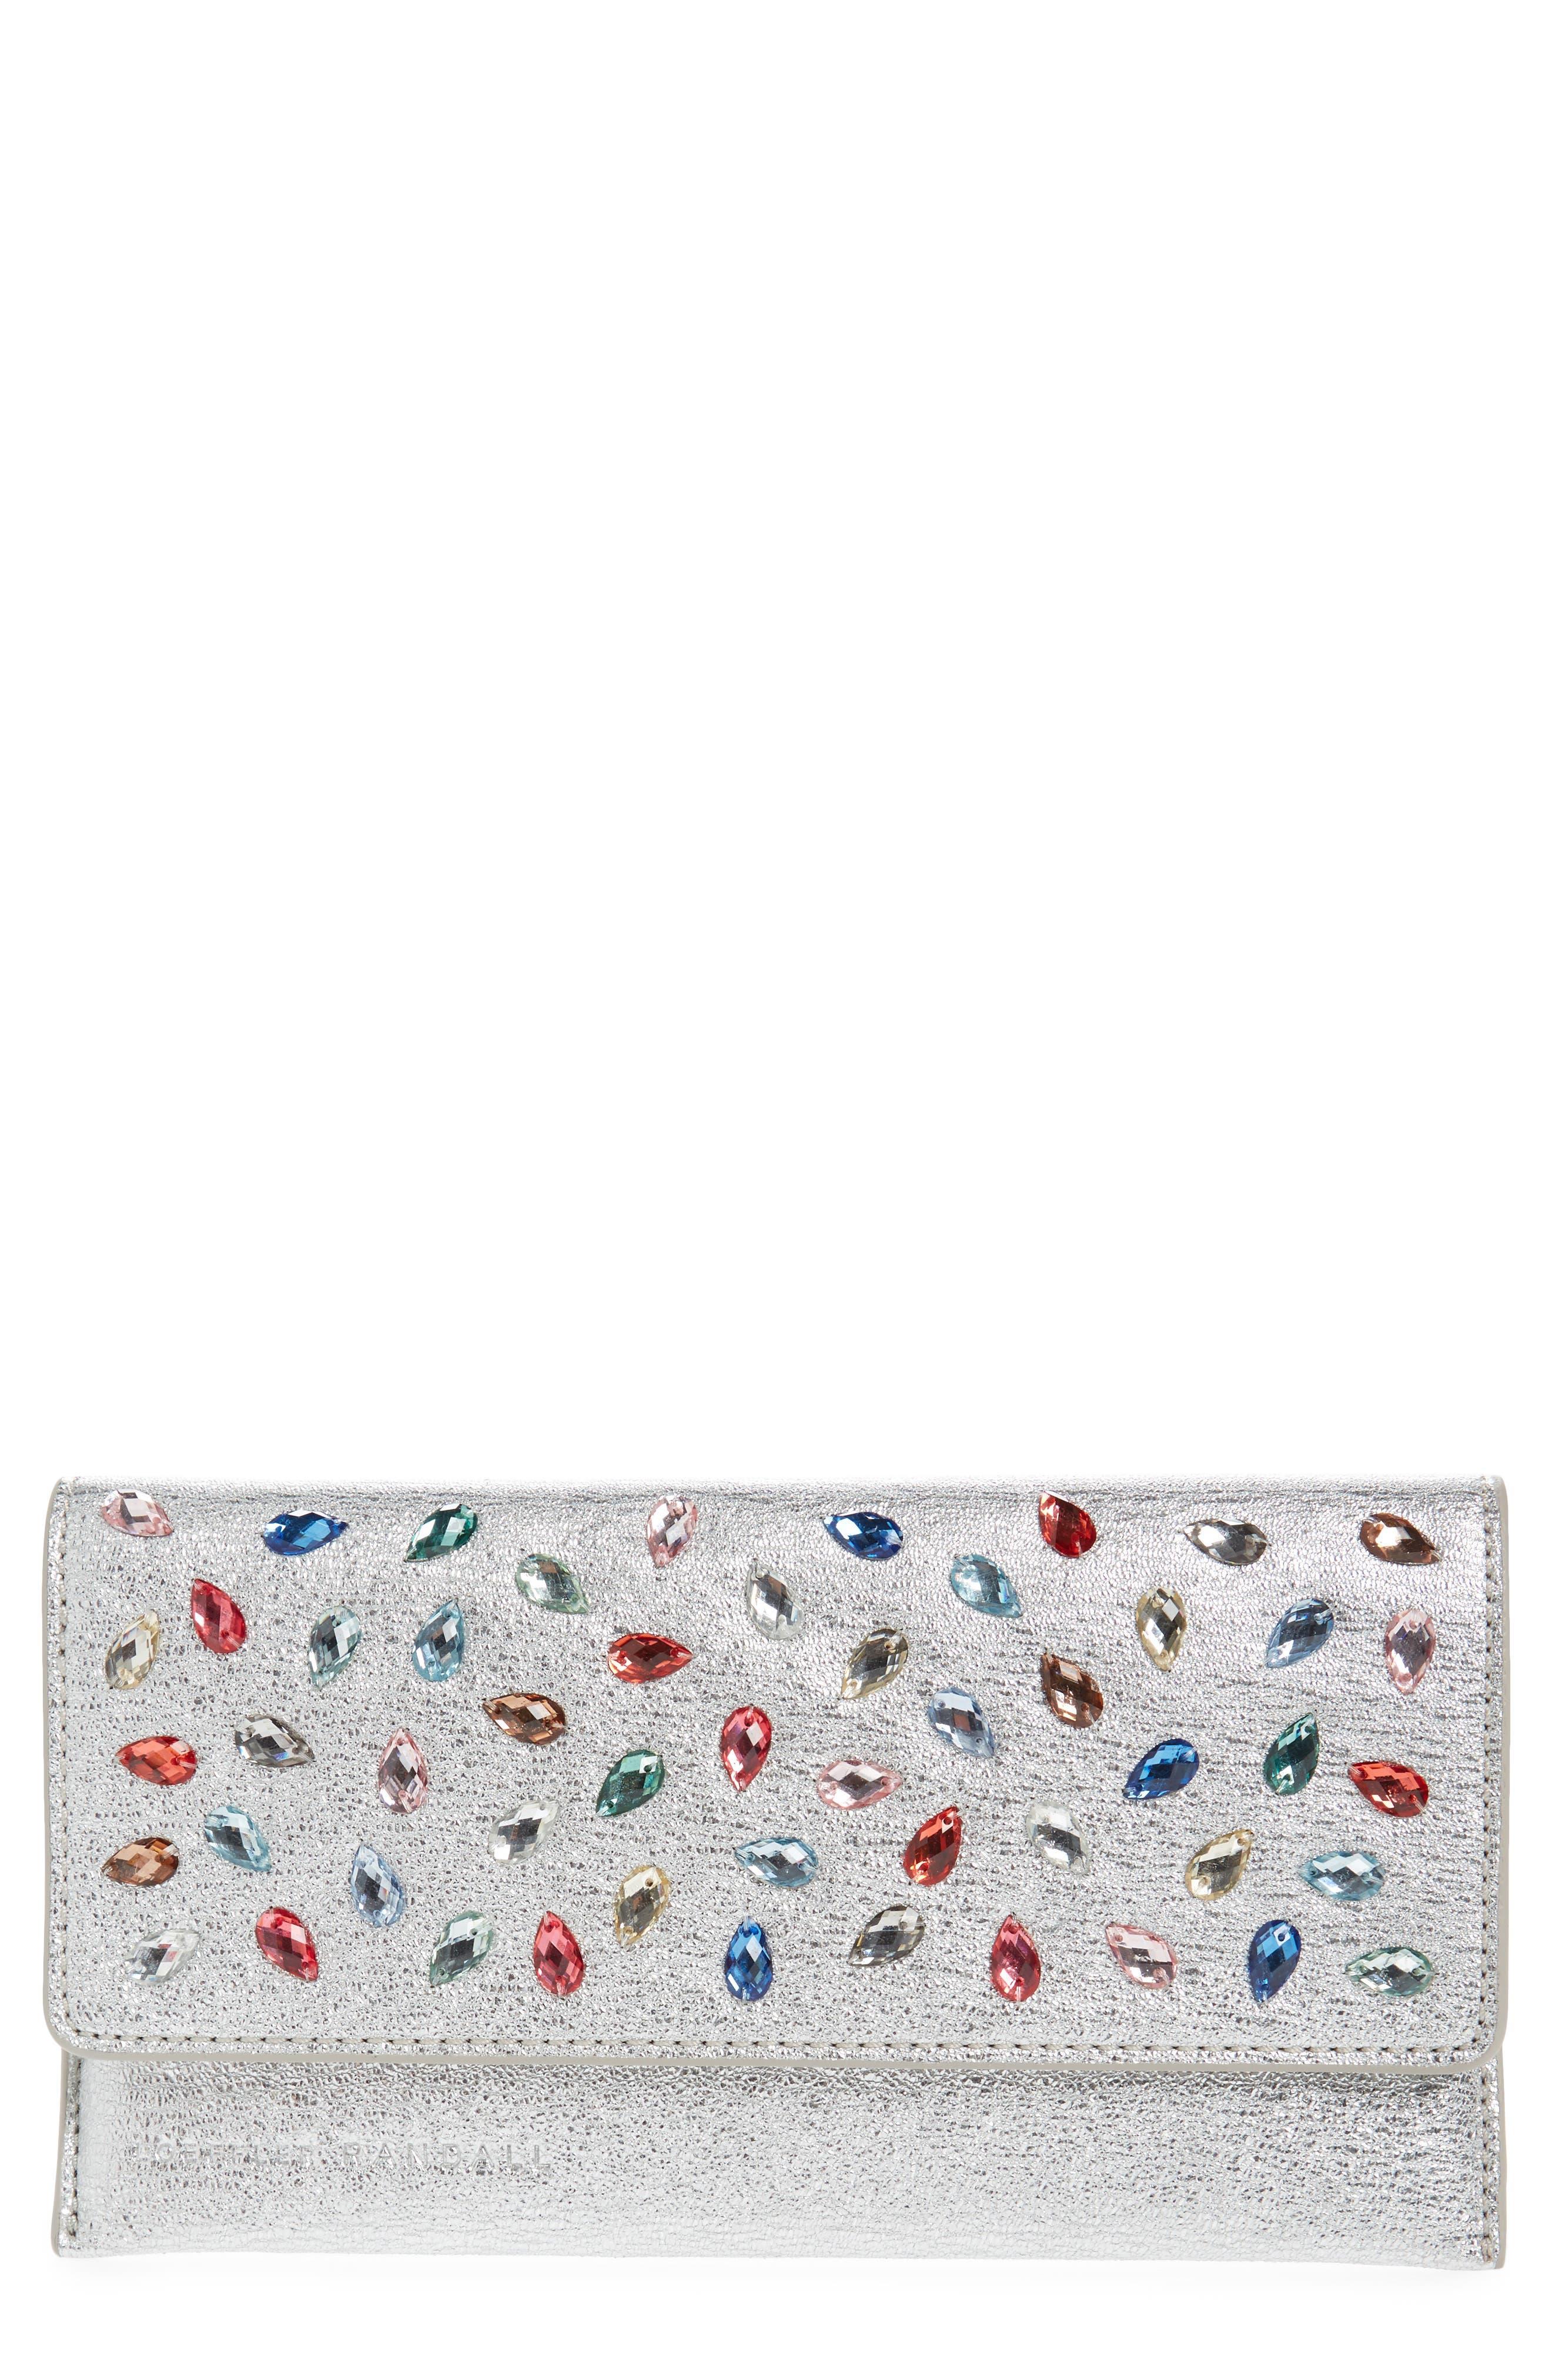 Alternate Image 1 Selected - Loeffler Randall Everything Crystal Embellished Leather Wallet